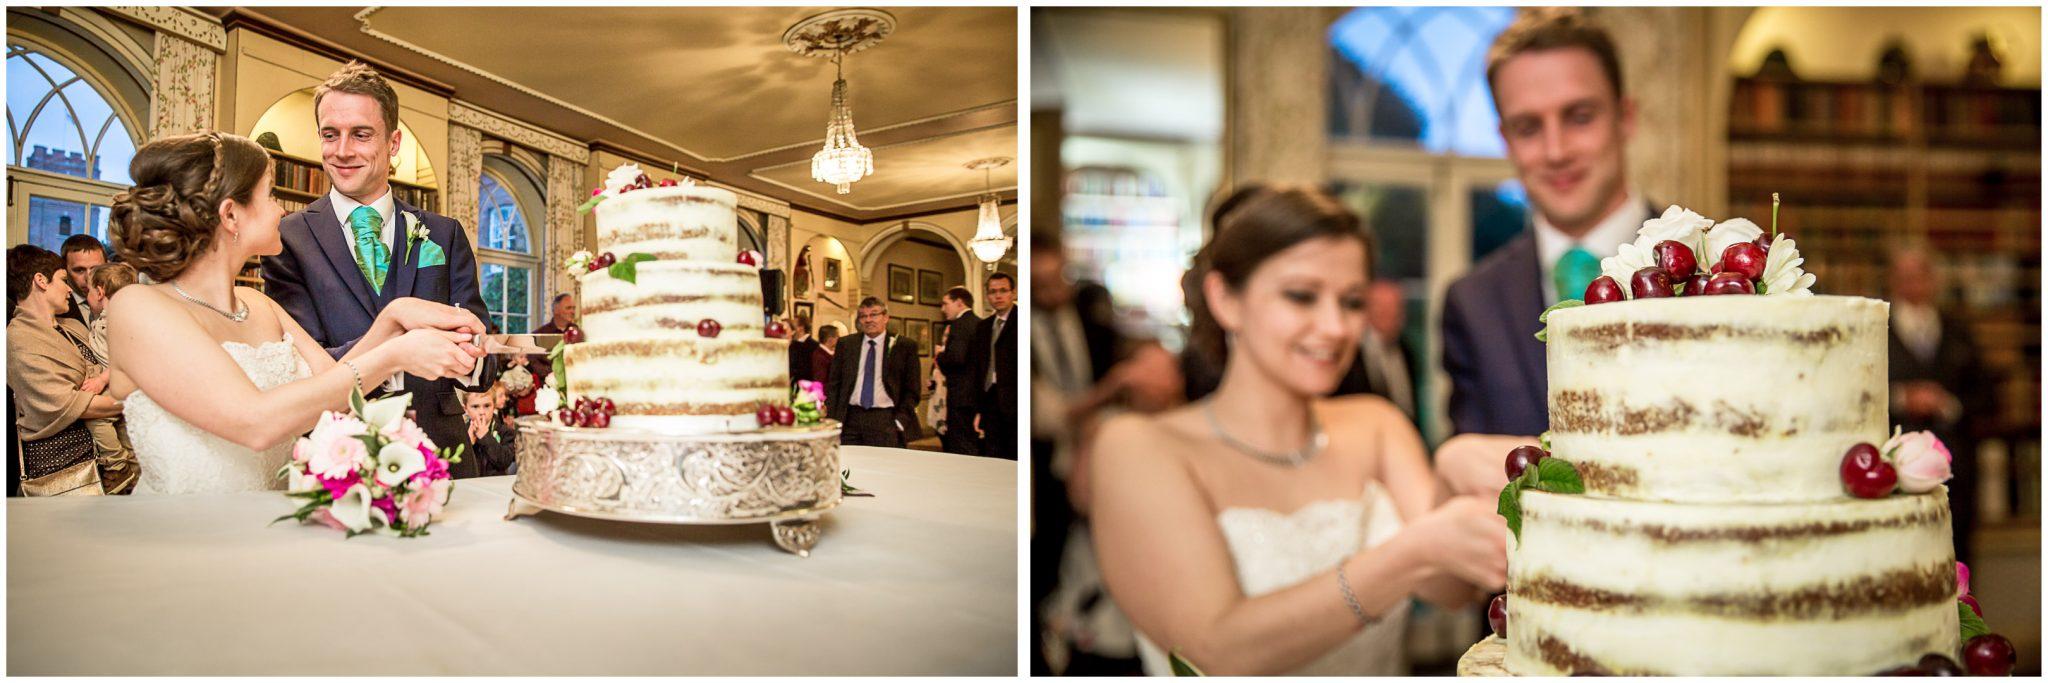 Avington Park wedding photography cutting the cake